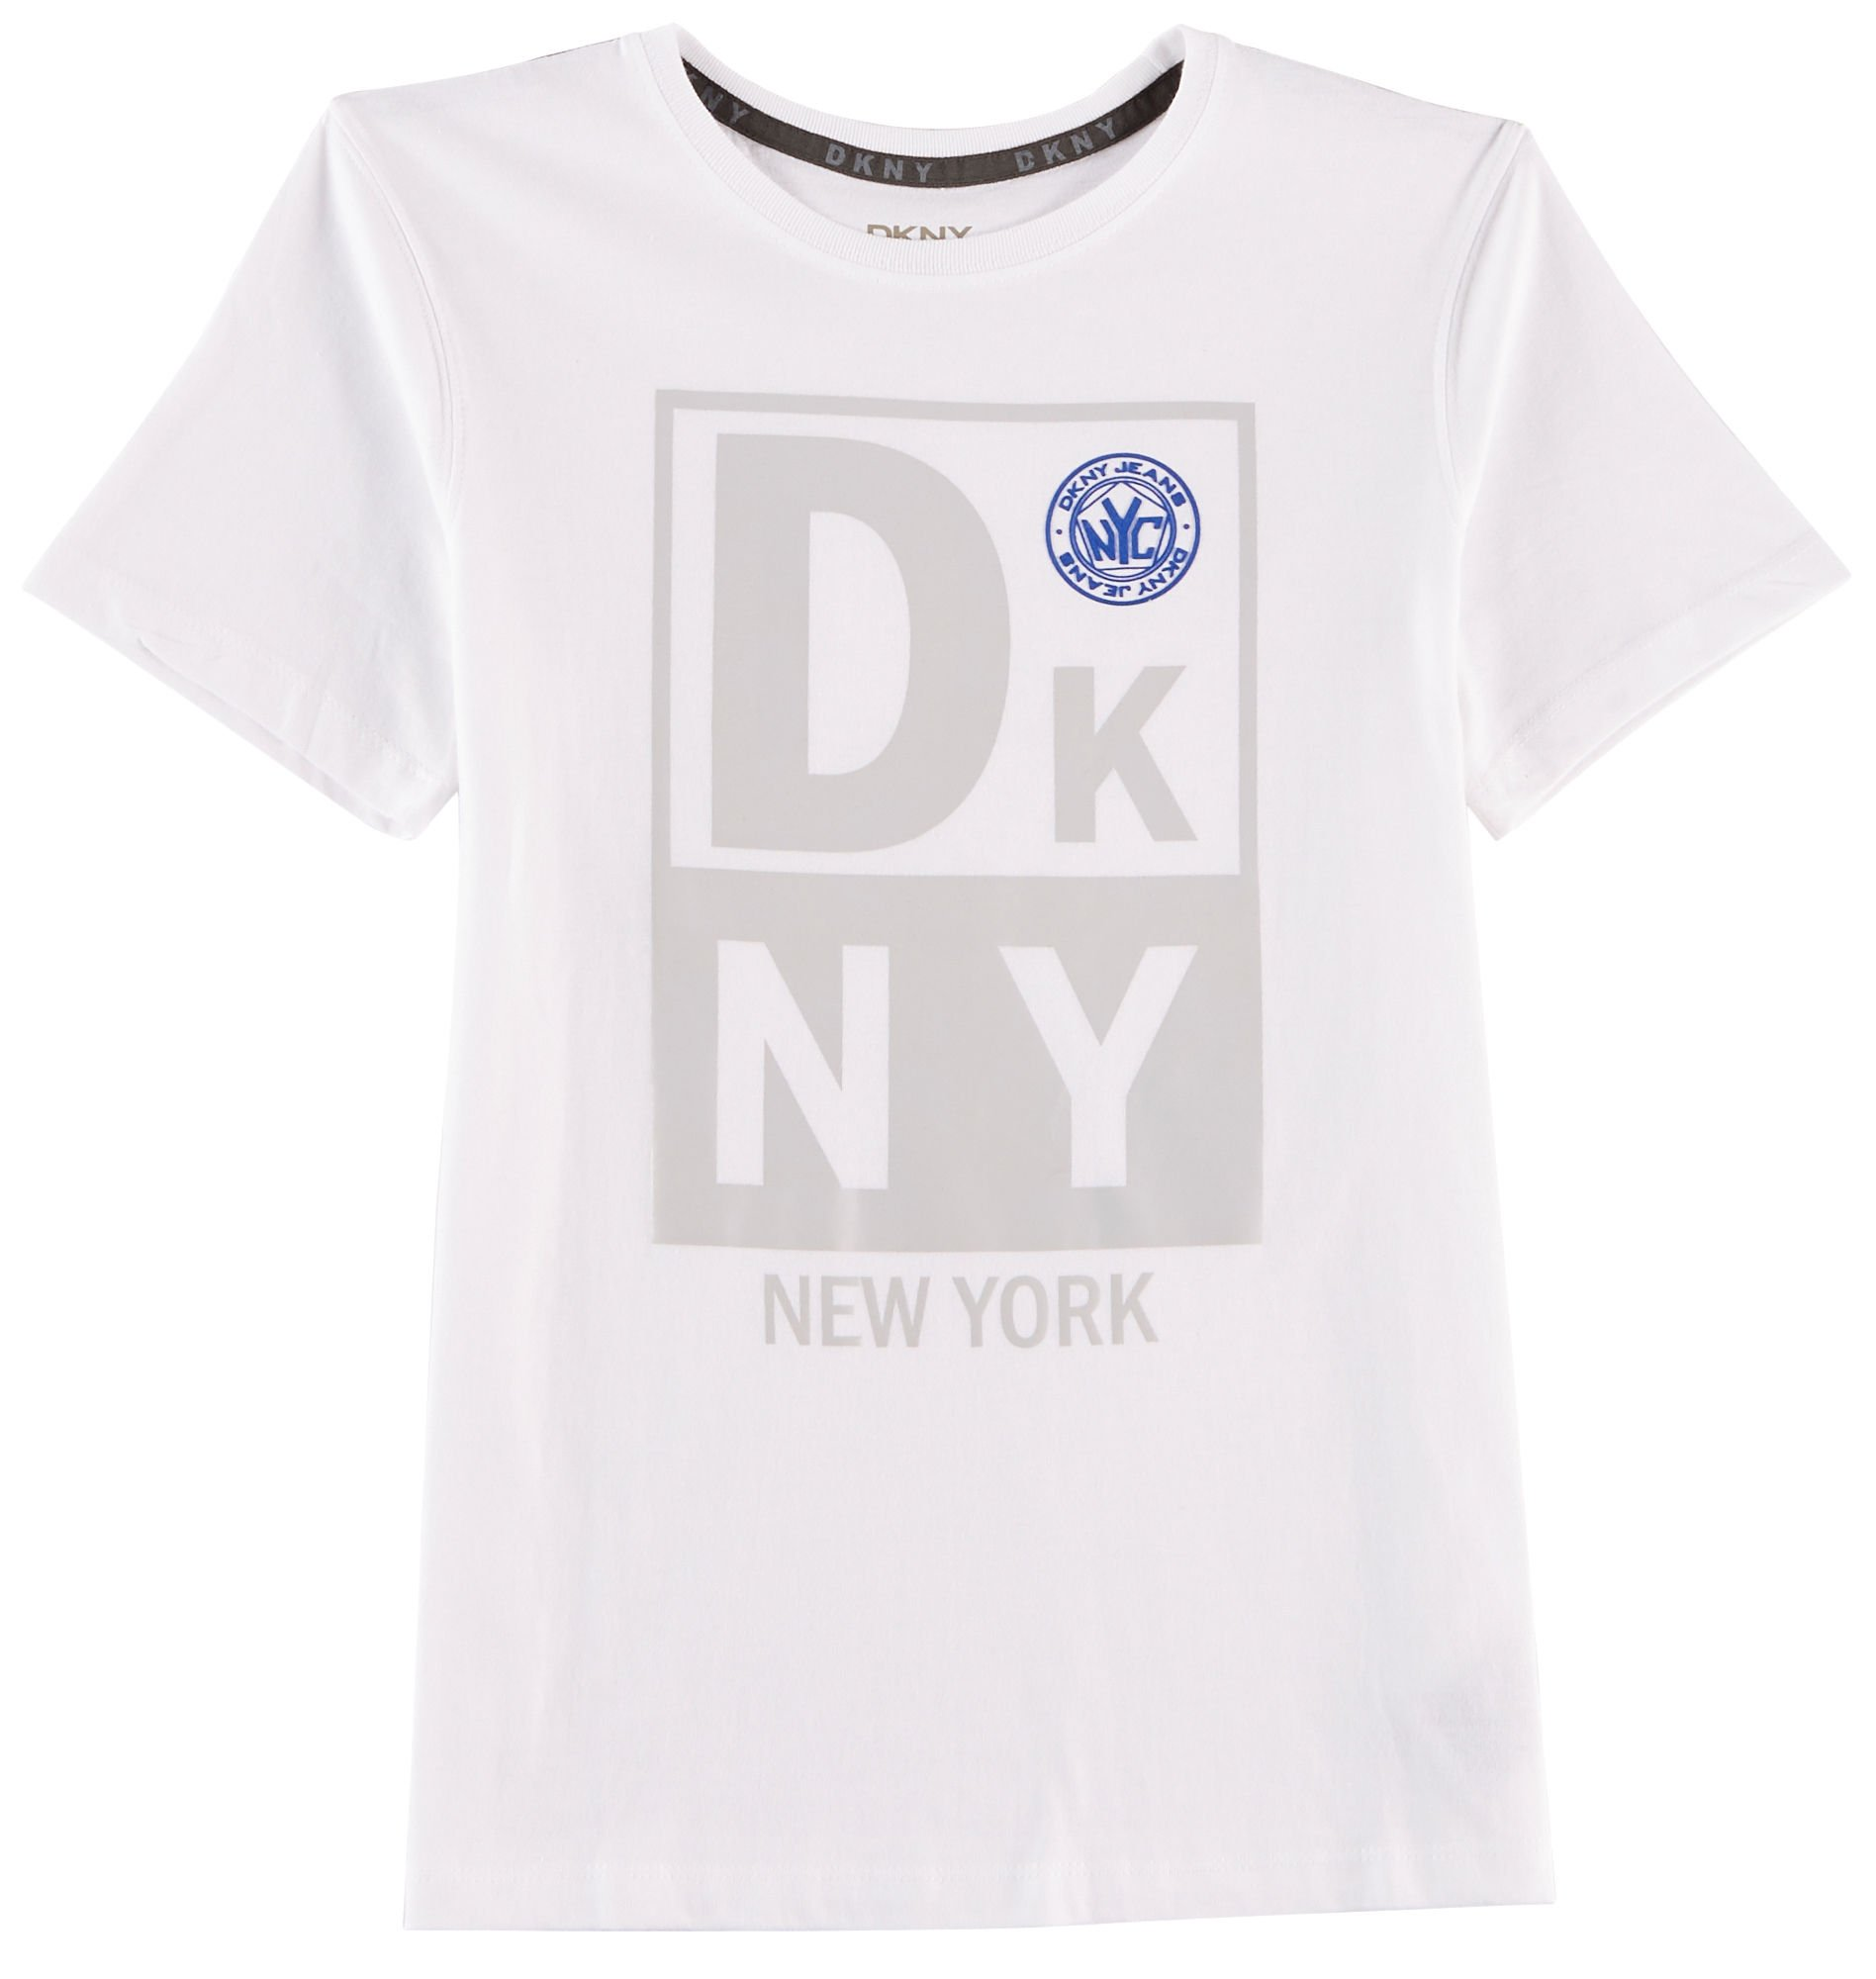 DKNY Boys' Big Short Sleeve T-Shirt, White Heather-KCKB, 8